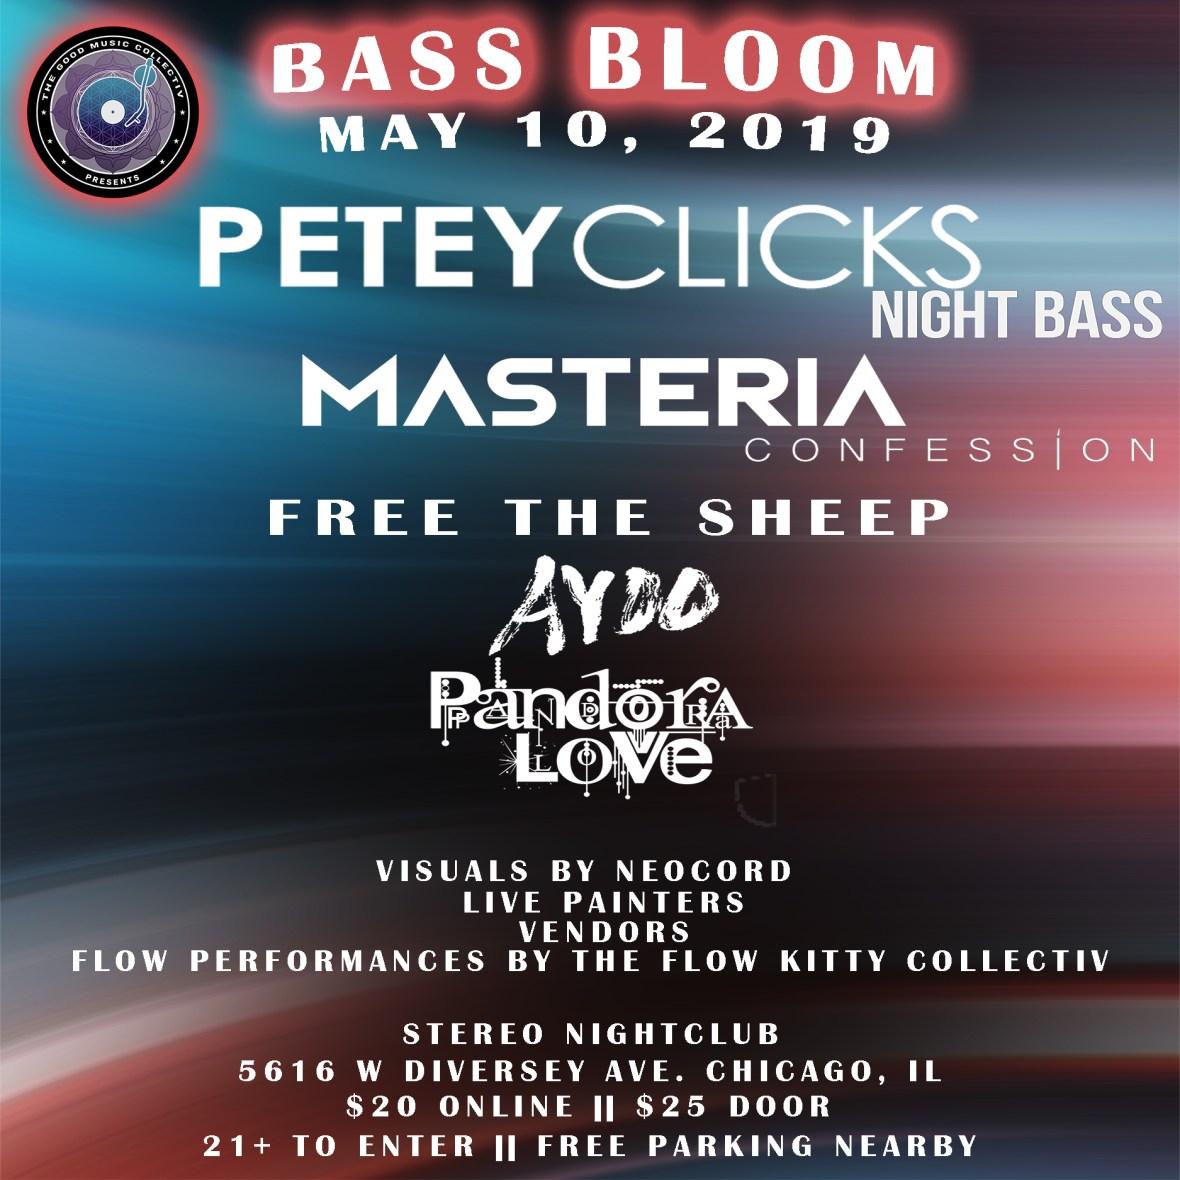 The Good Music Collectiv Presents: Bass Bloom #3 ft. Petey Clicks, MASTERIA, Free The Sheep, AYOO, Pandora Love & more!